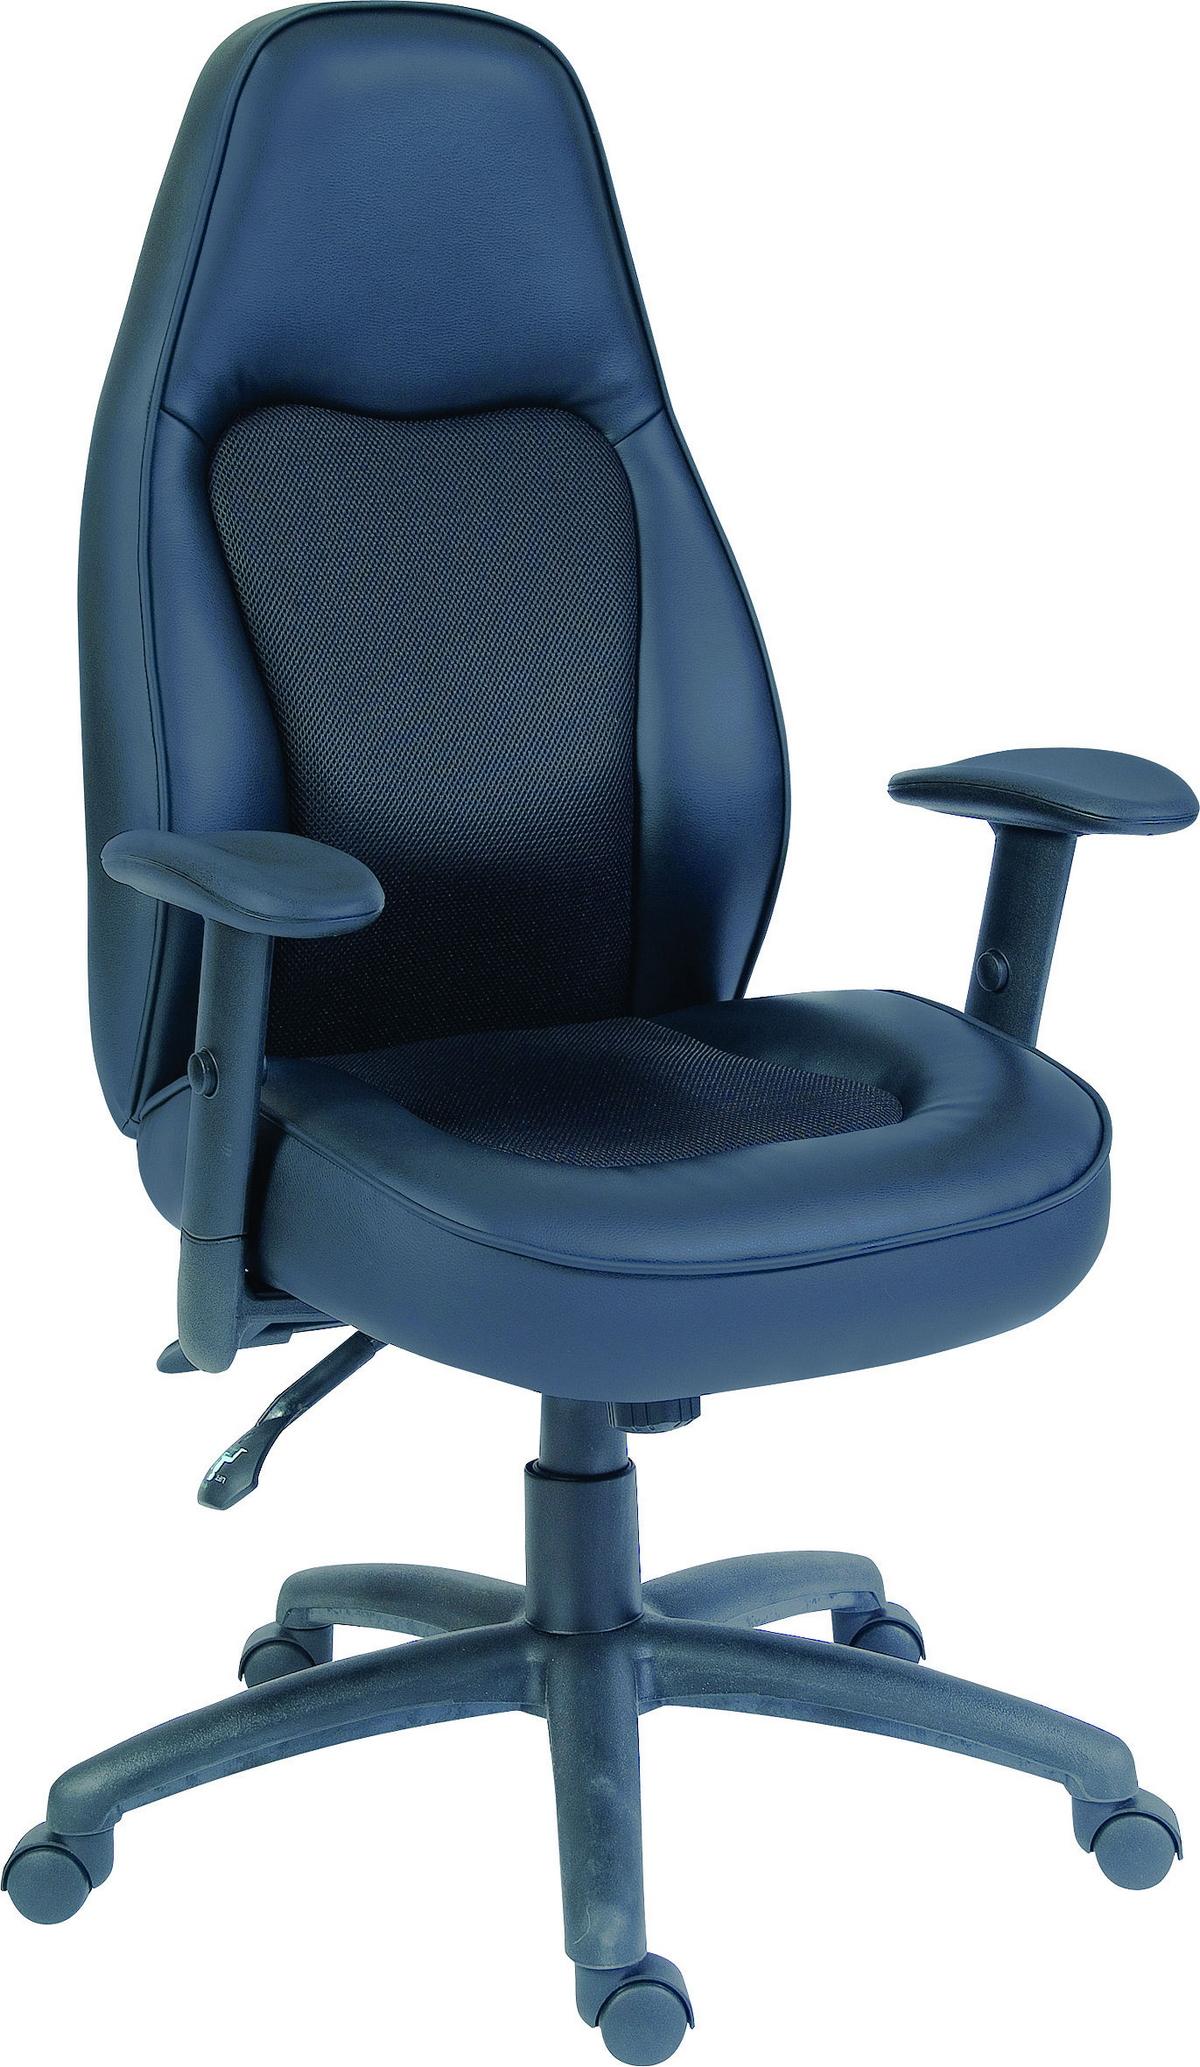 Rapide Ergonomic Office Chair Posture Chairs Uk